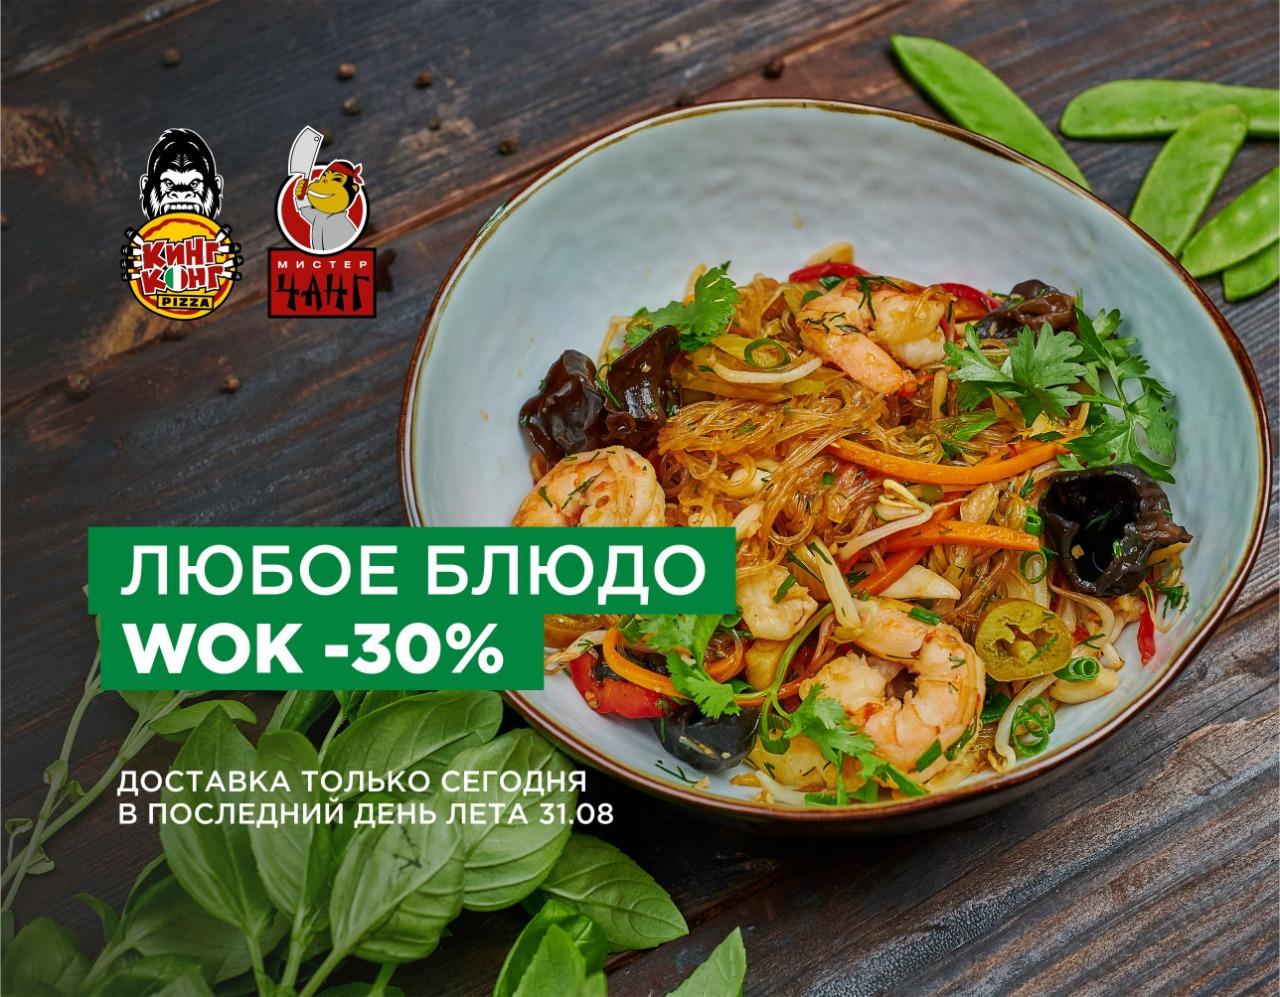 Любимое блюдо WOK -30%